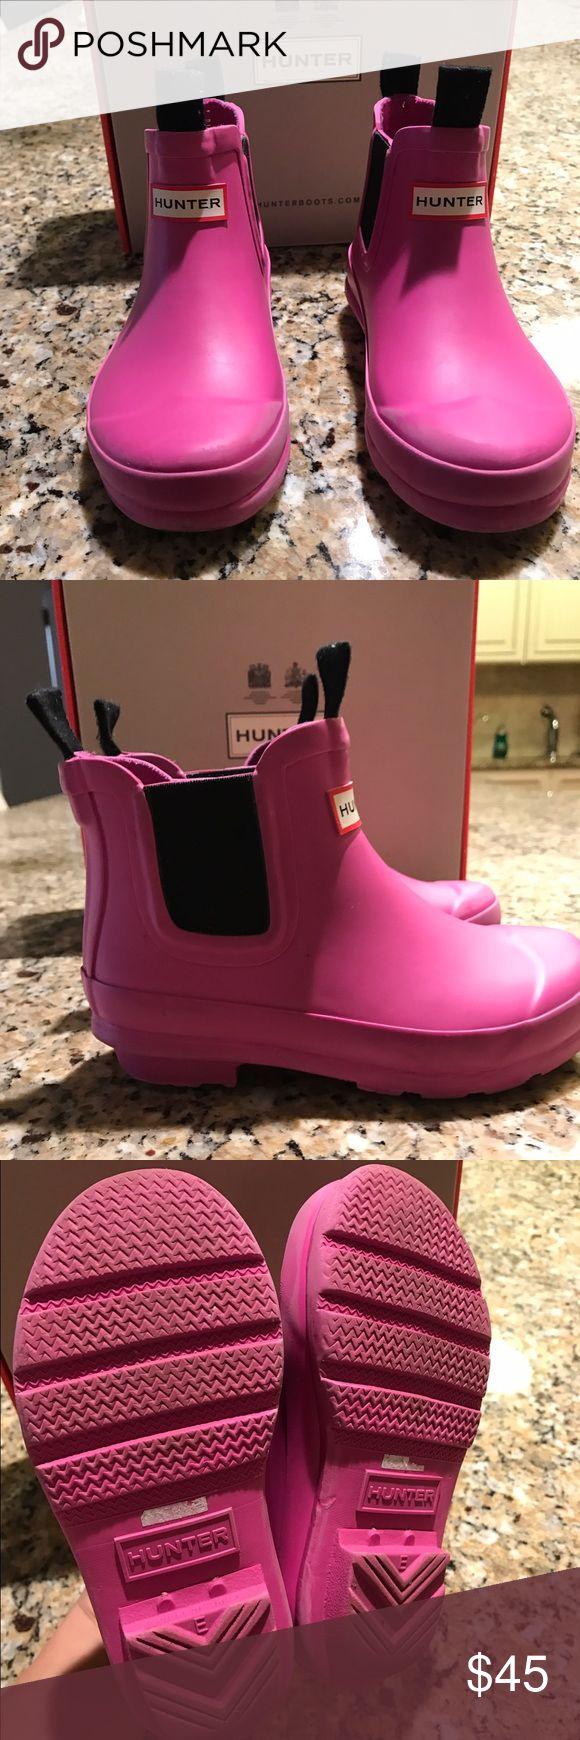 Hunter Rain boots for girls Hunter Chelsea rain boots for girls size 10t - barely worn like new Hunter Boots Shoes Winter & Rain Boots